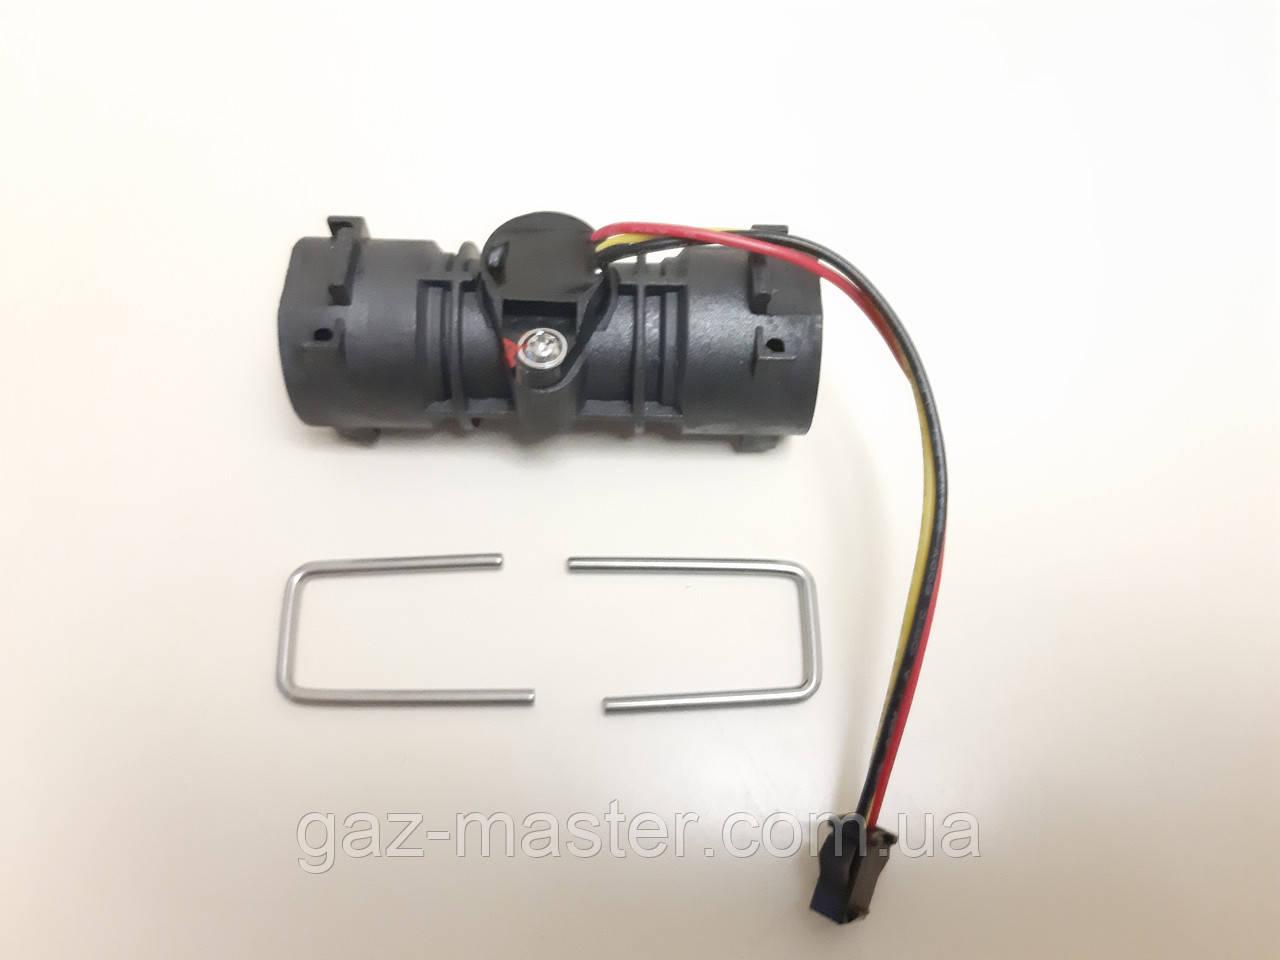 Датчик протока (реле протока) 3 провода под защёлку